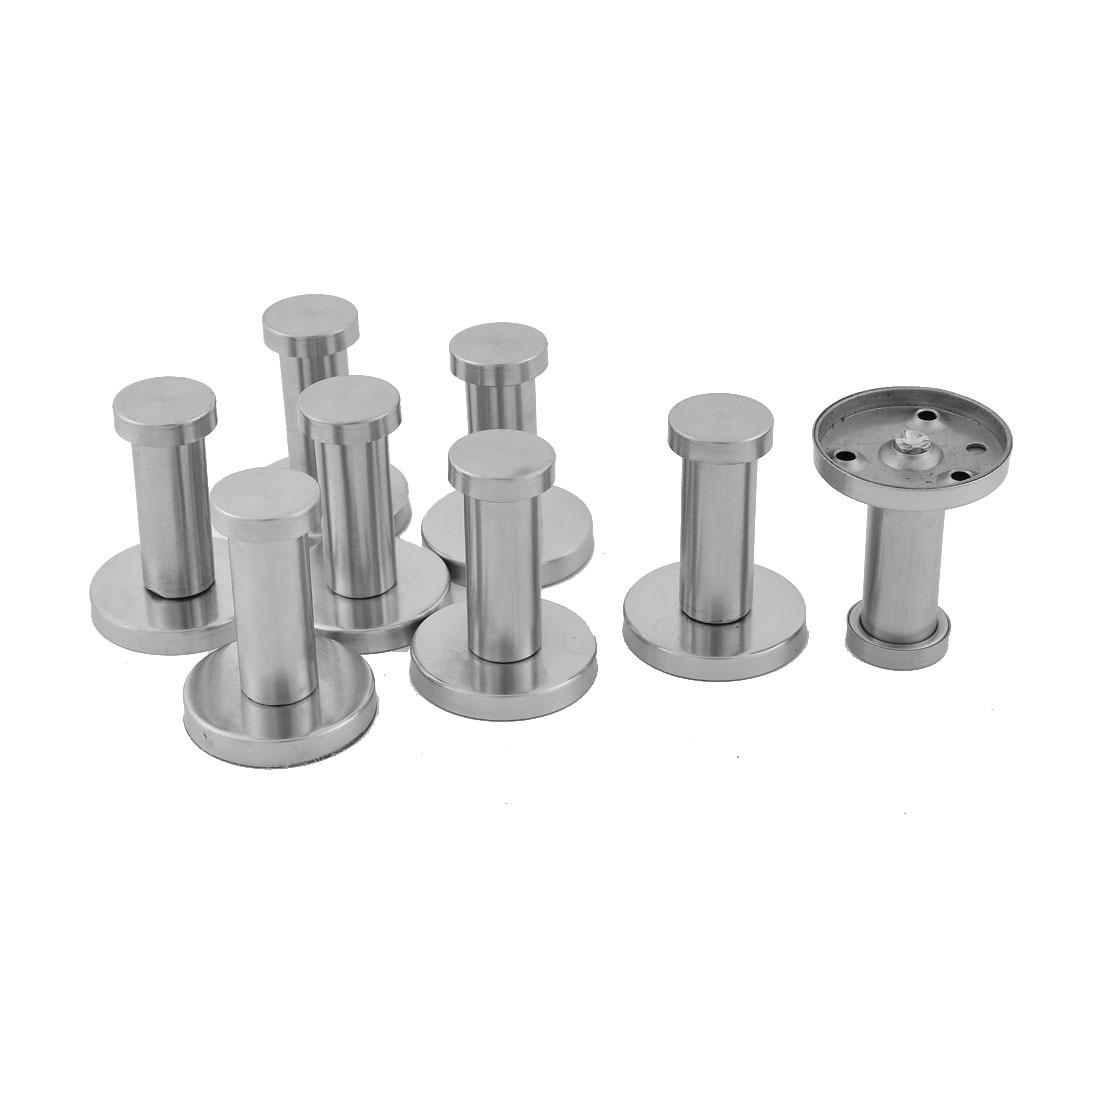 Satin stainless steel wall mounted hook - Online Get Cheap Coat Hooks Round Aliexpresscom Alibaba Group Uxcell Pcs Stainless Steel Round Wall Mount